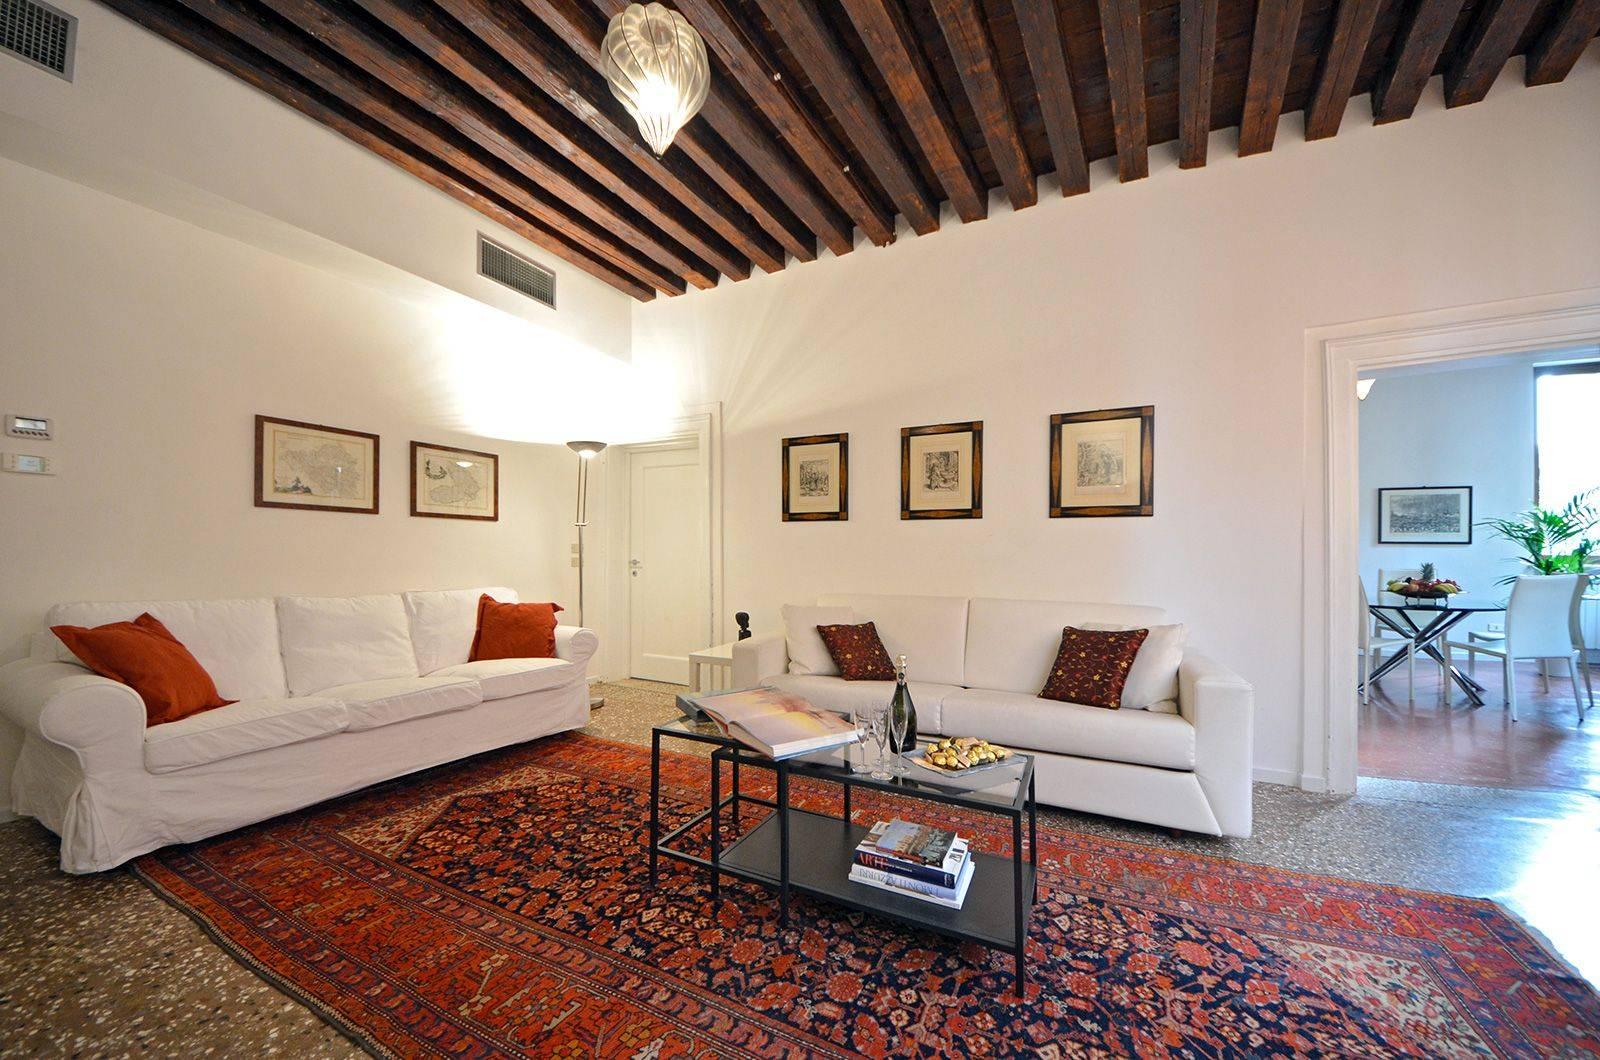 the house has terrazzo Venezian flooring and original woodem beamed ceilings